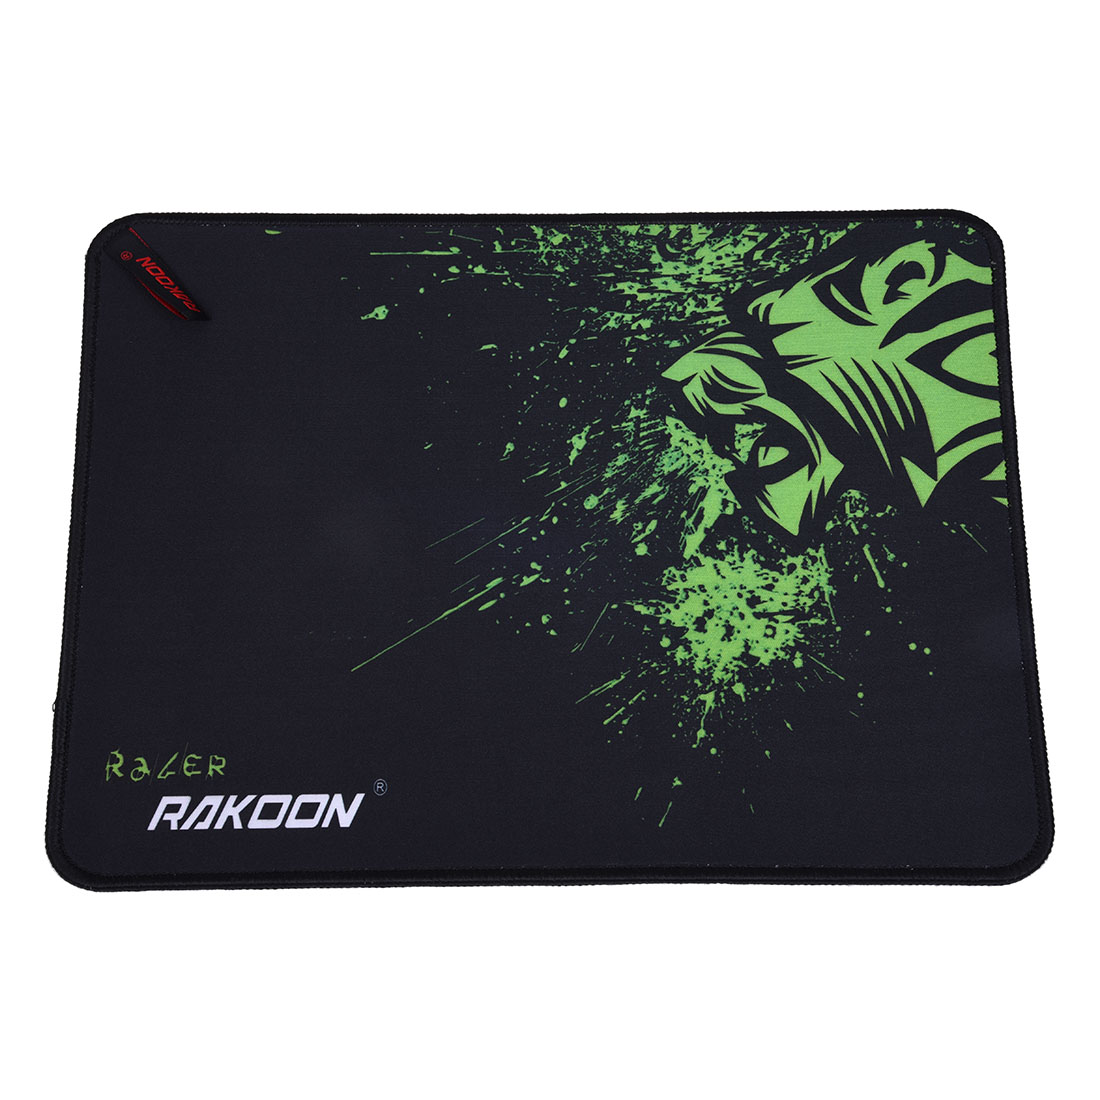 RAKOON Locking Edge Large Mouse Mat For CS Go World Of Tanks Starcraft Mousepad green(Speed 24*32CM)